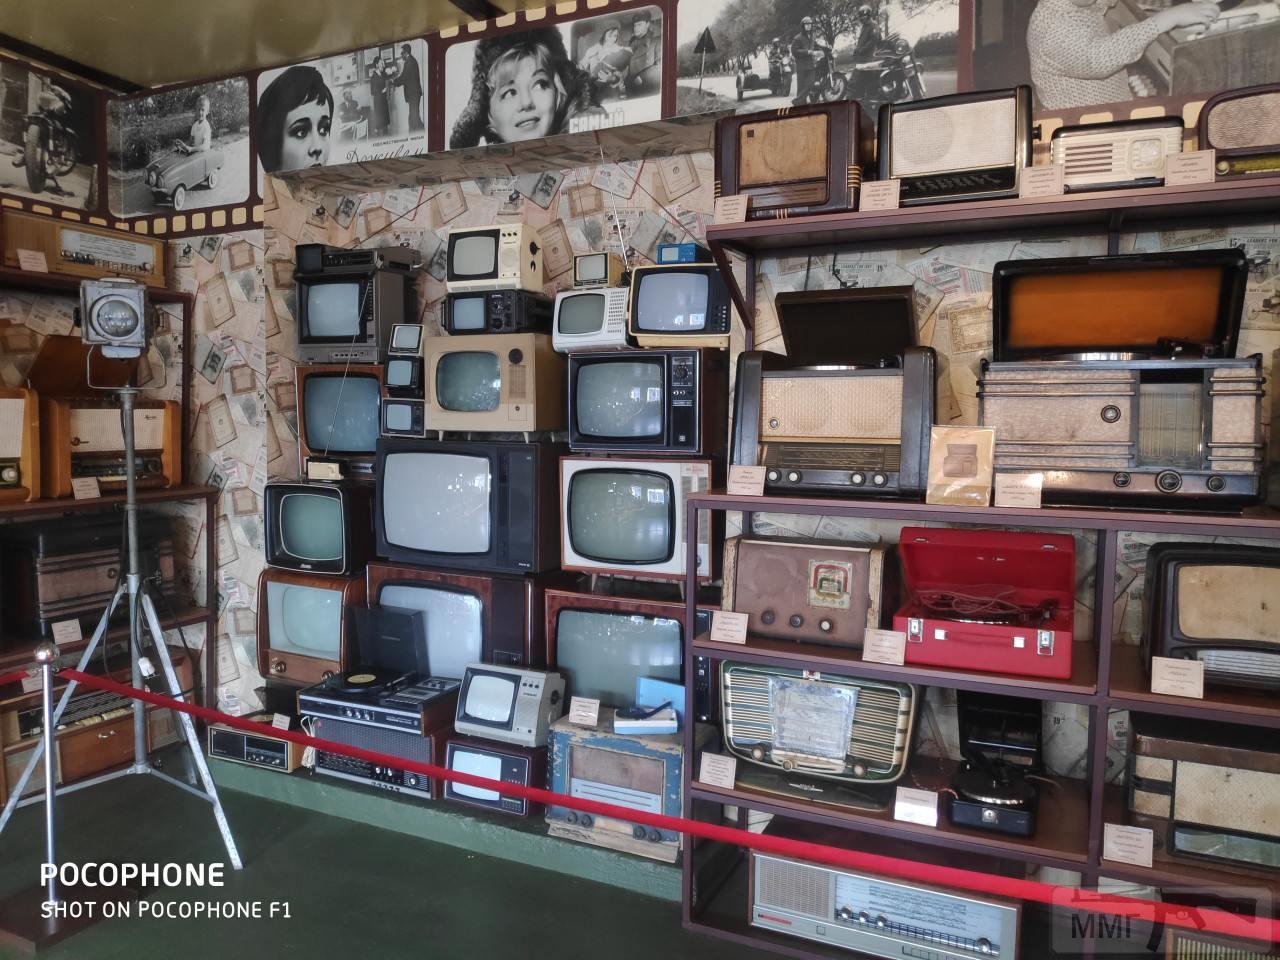 71128 - Музей техники Фаэтон в г. Запорожье